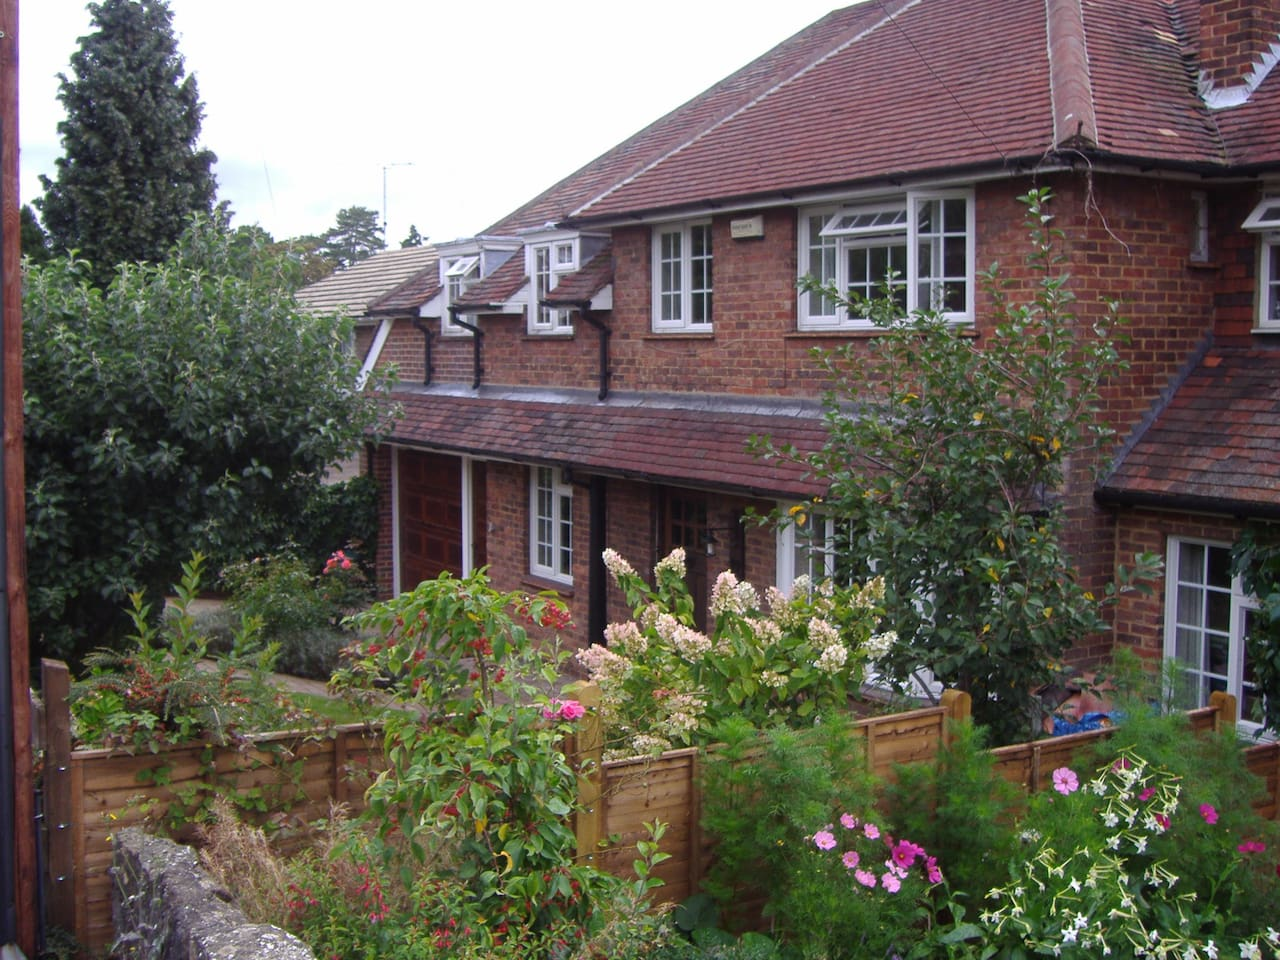 12 Hillside Road bed and breakfast in Sevenoaks